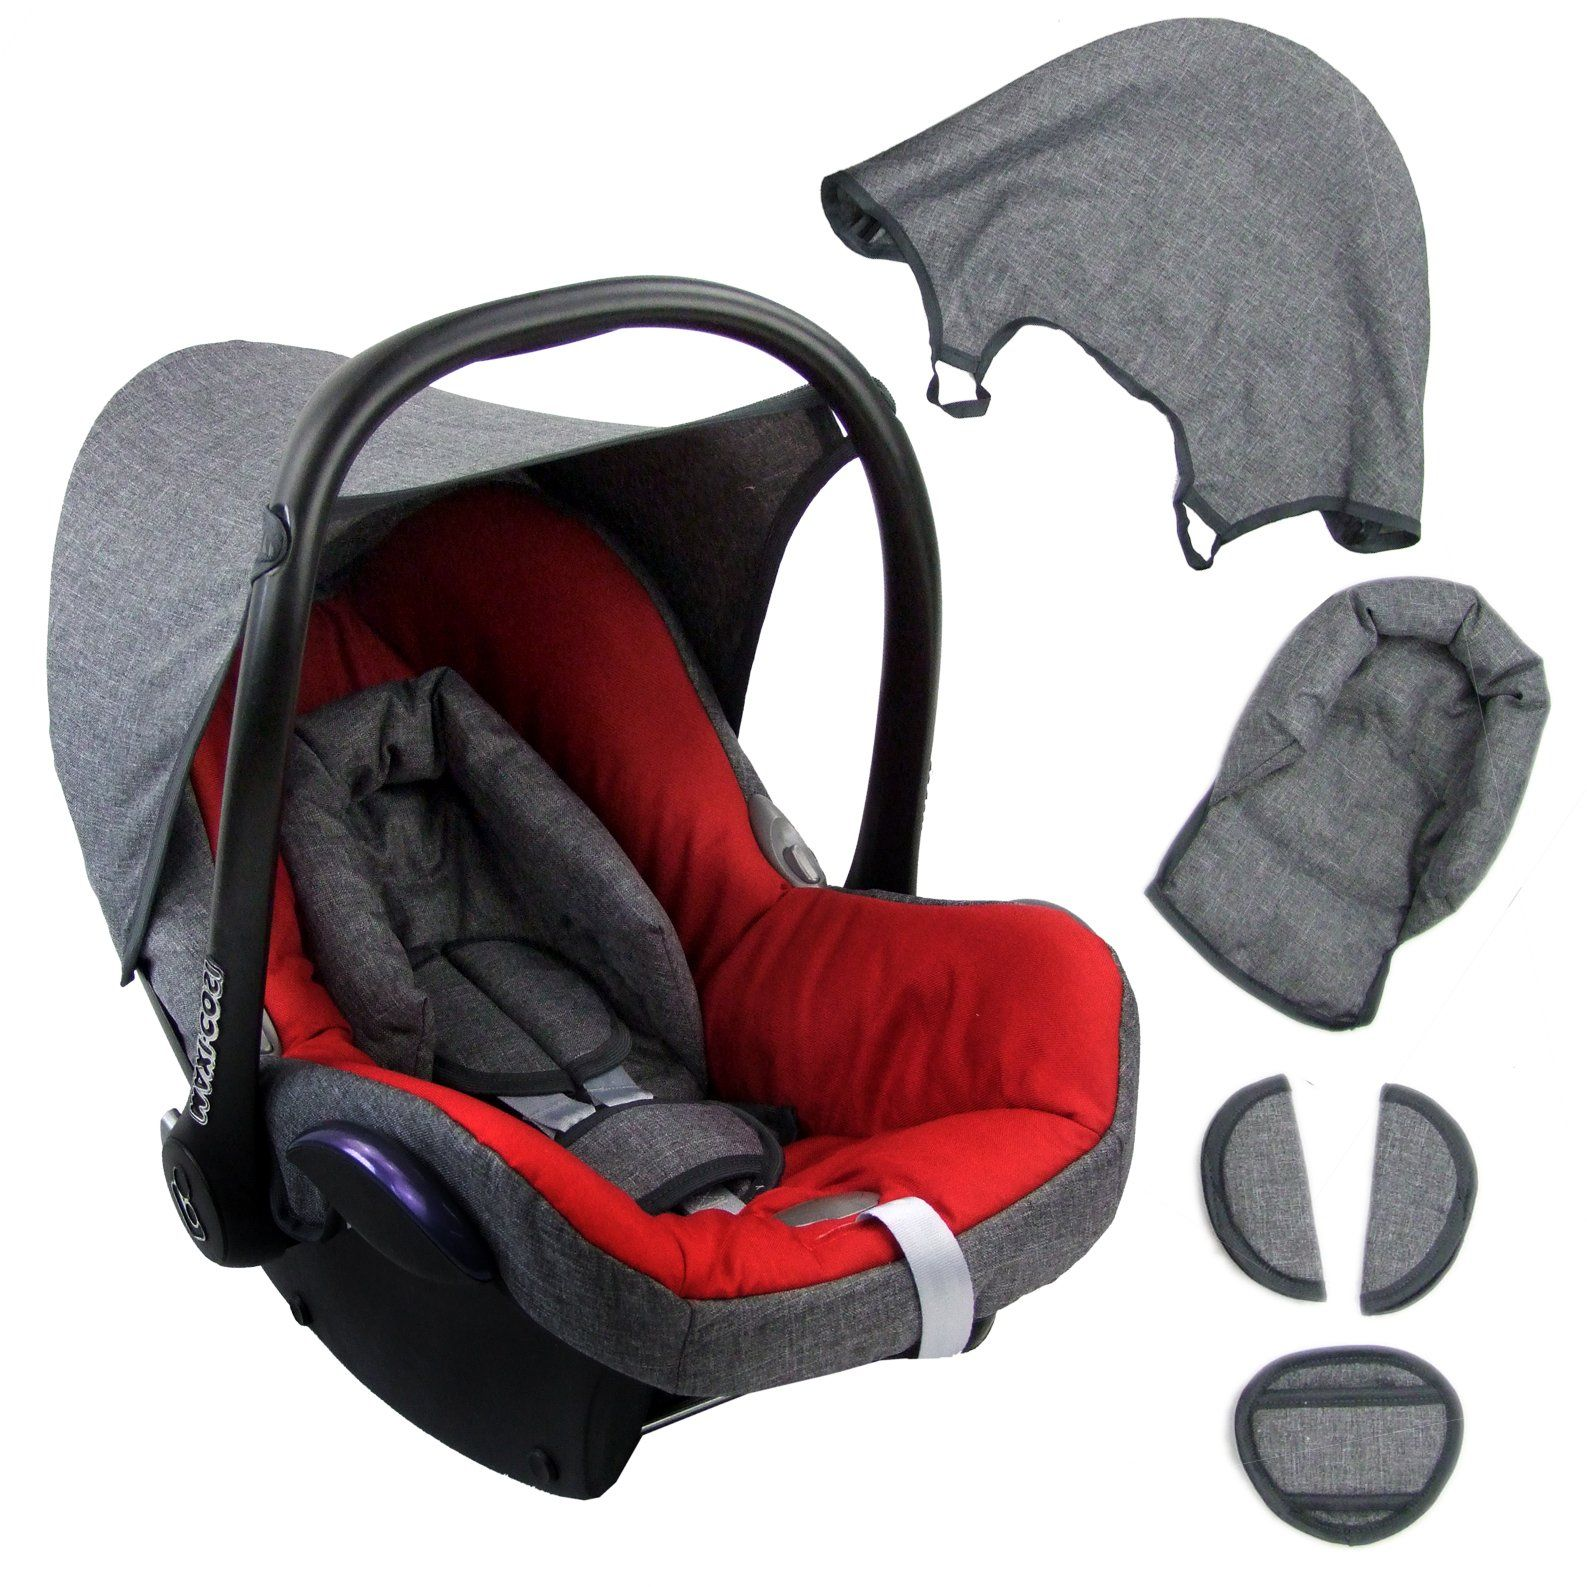 Bambiniwelt Ersatzbezug F R Maxi Cosi Cabriofix 6 Tlg Grau Rot Bezug F R Babyschale Komplett Set In 2020 Baby Car Seats Car Seats Baby Car